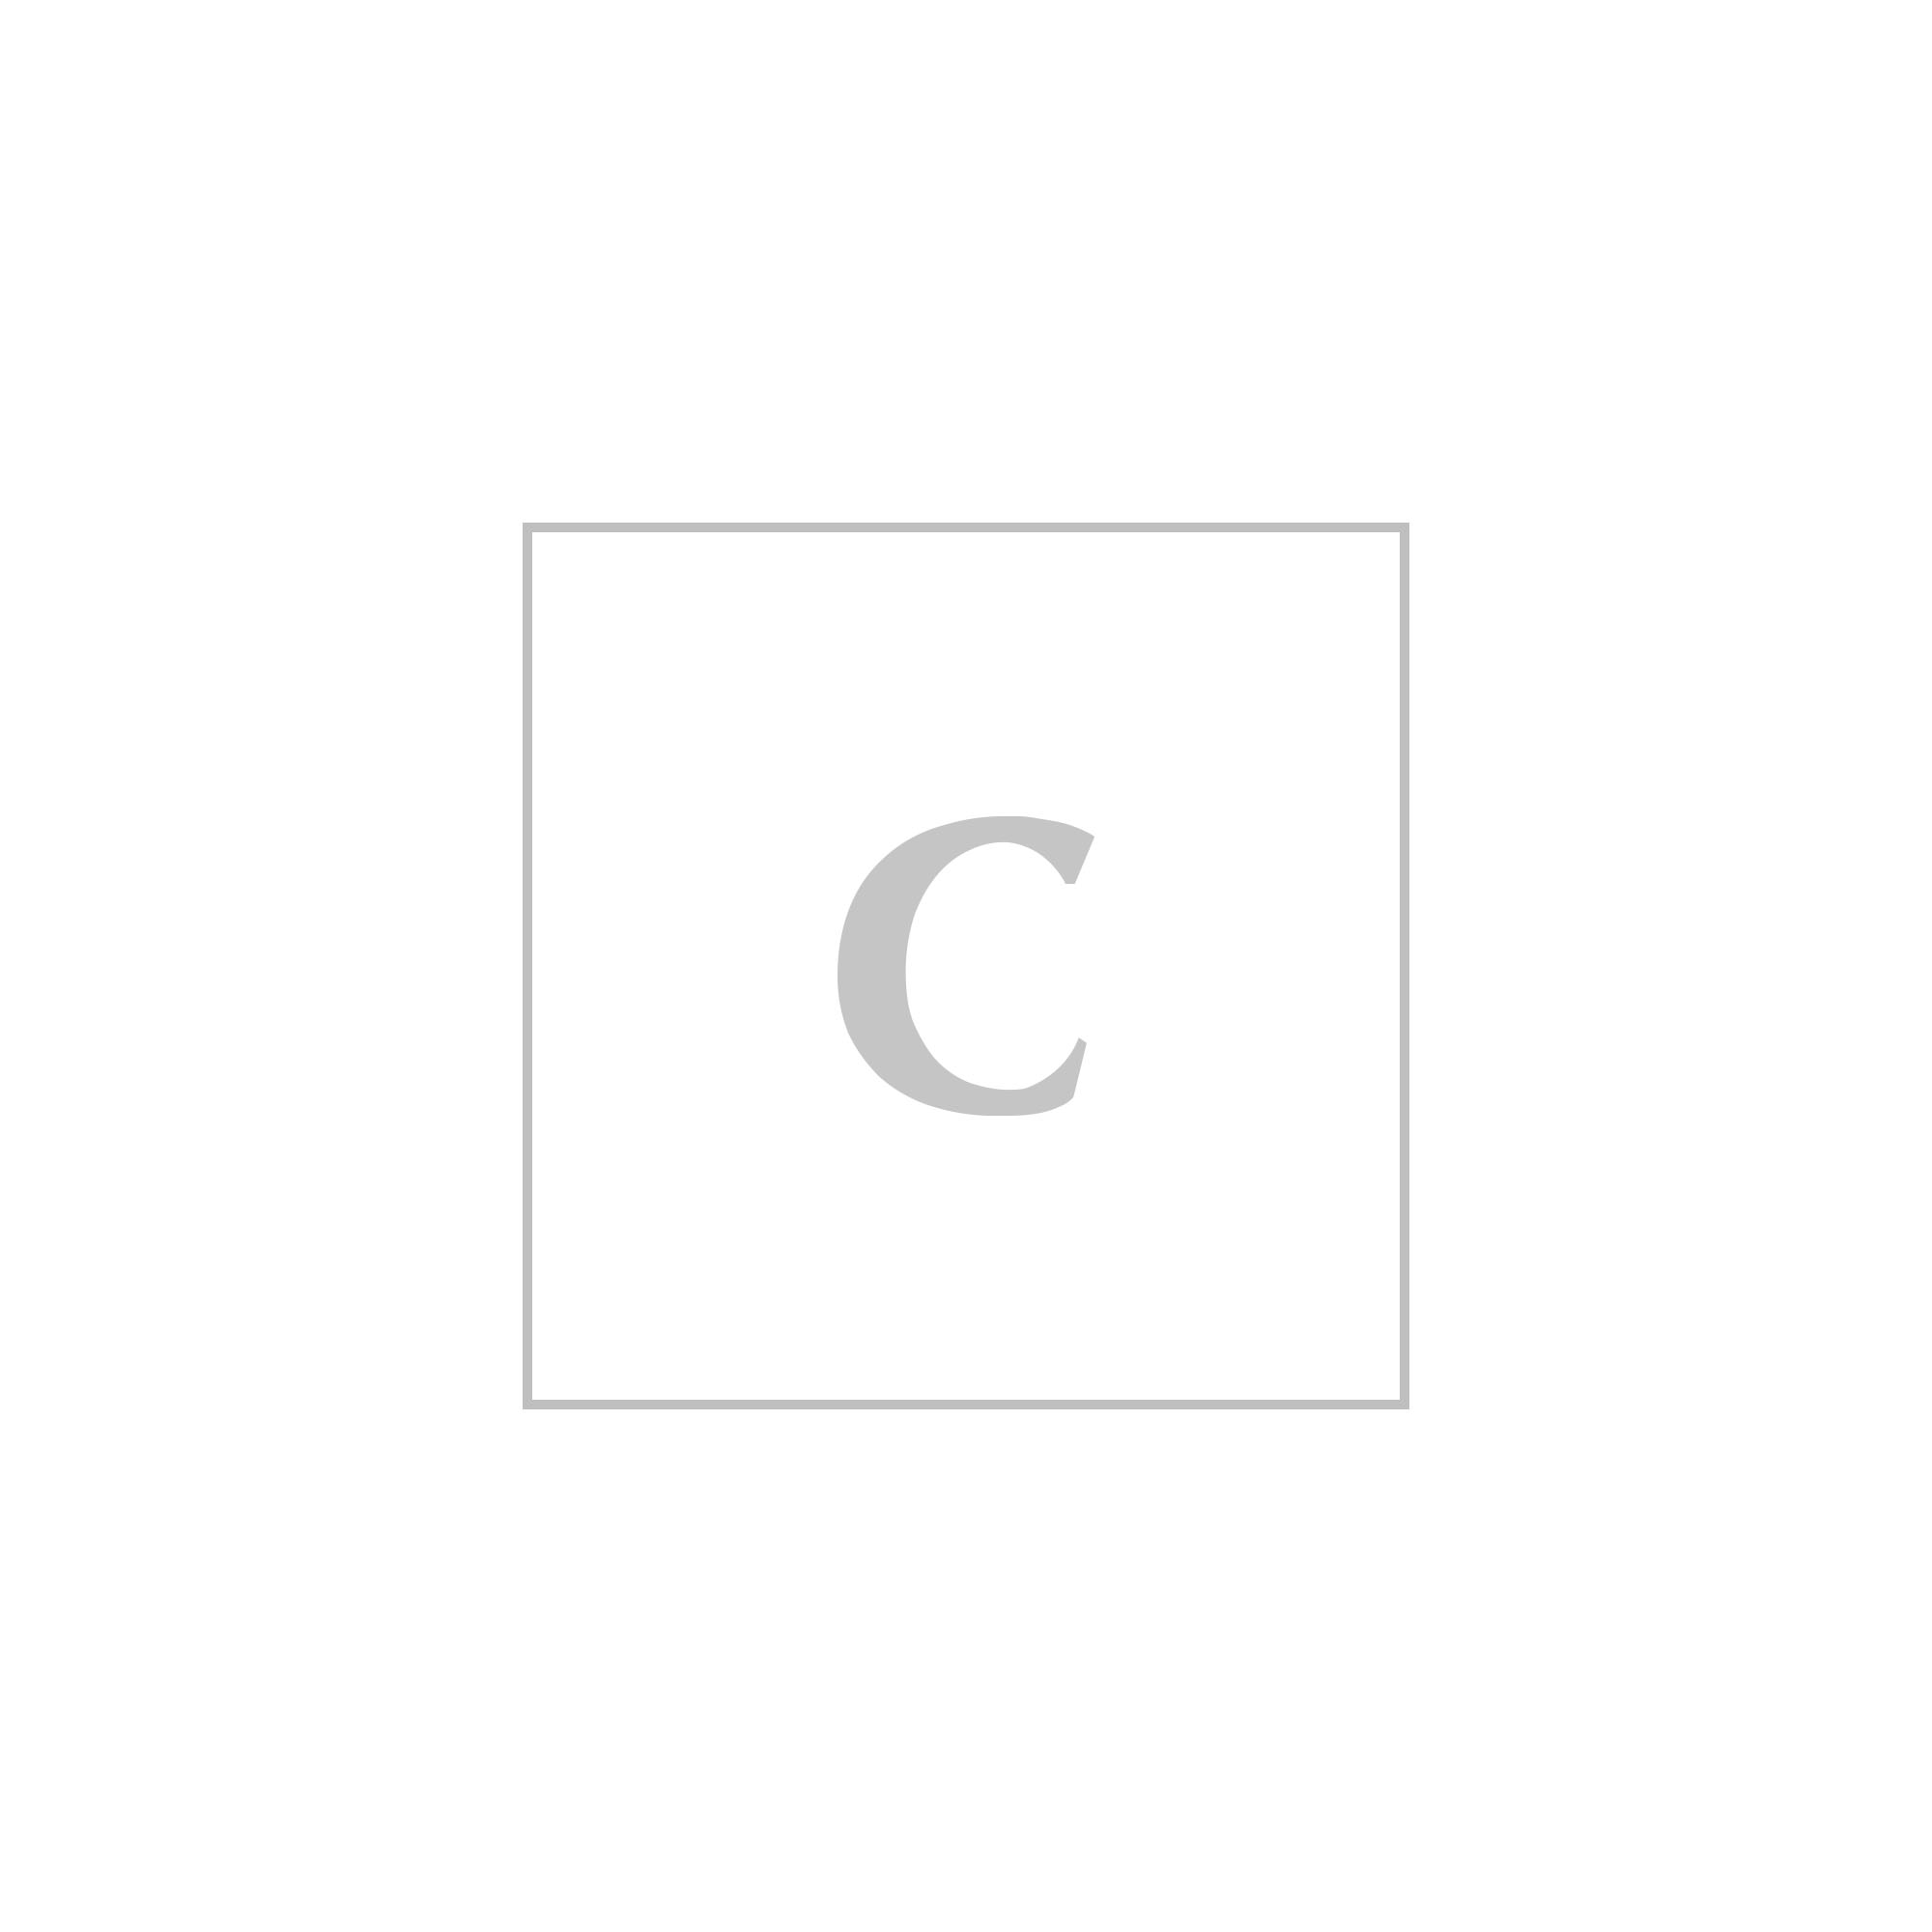 Christian Dior borsa miss dior mini tricolor cannag